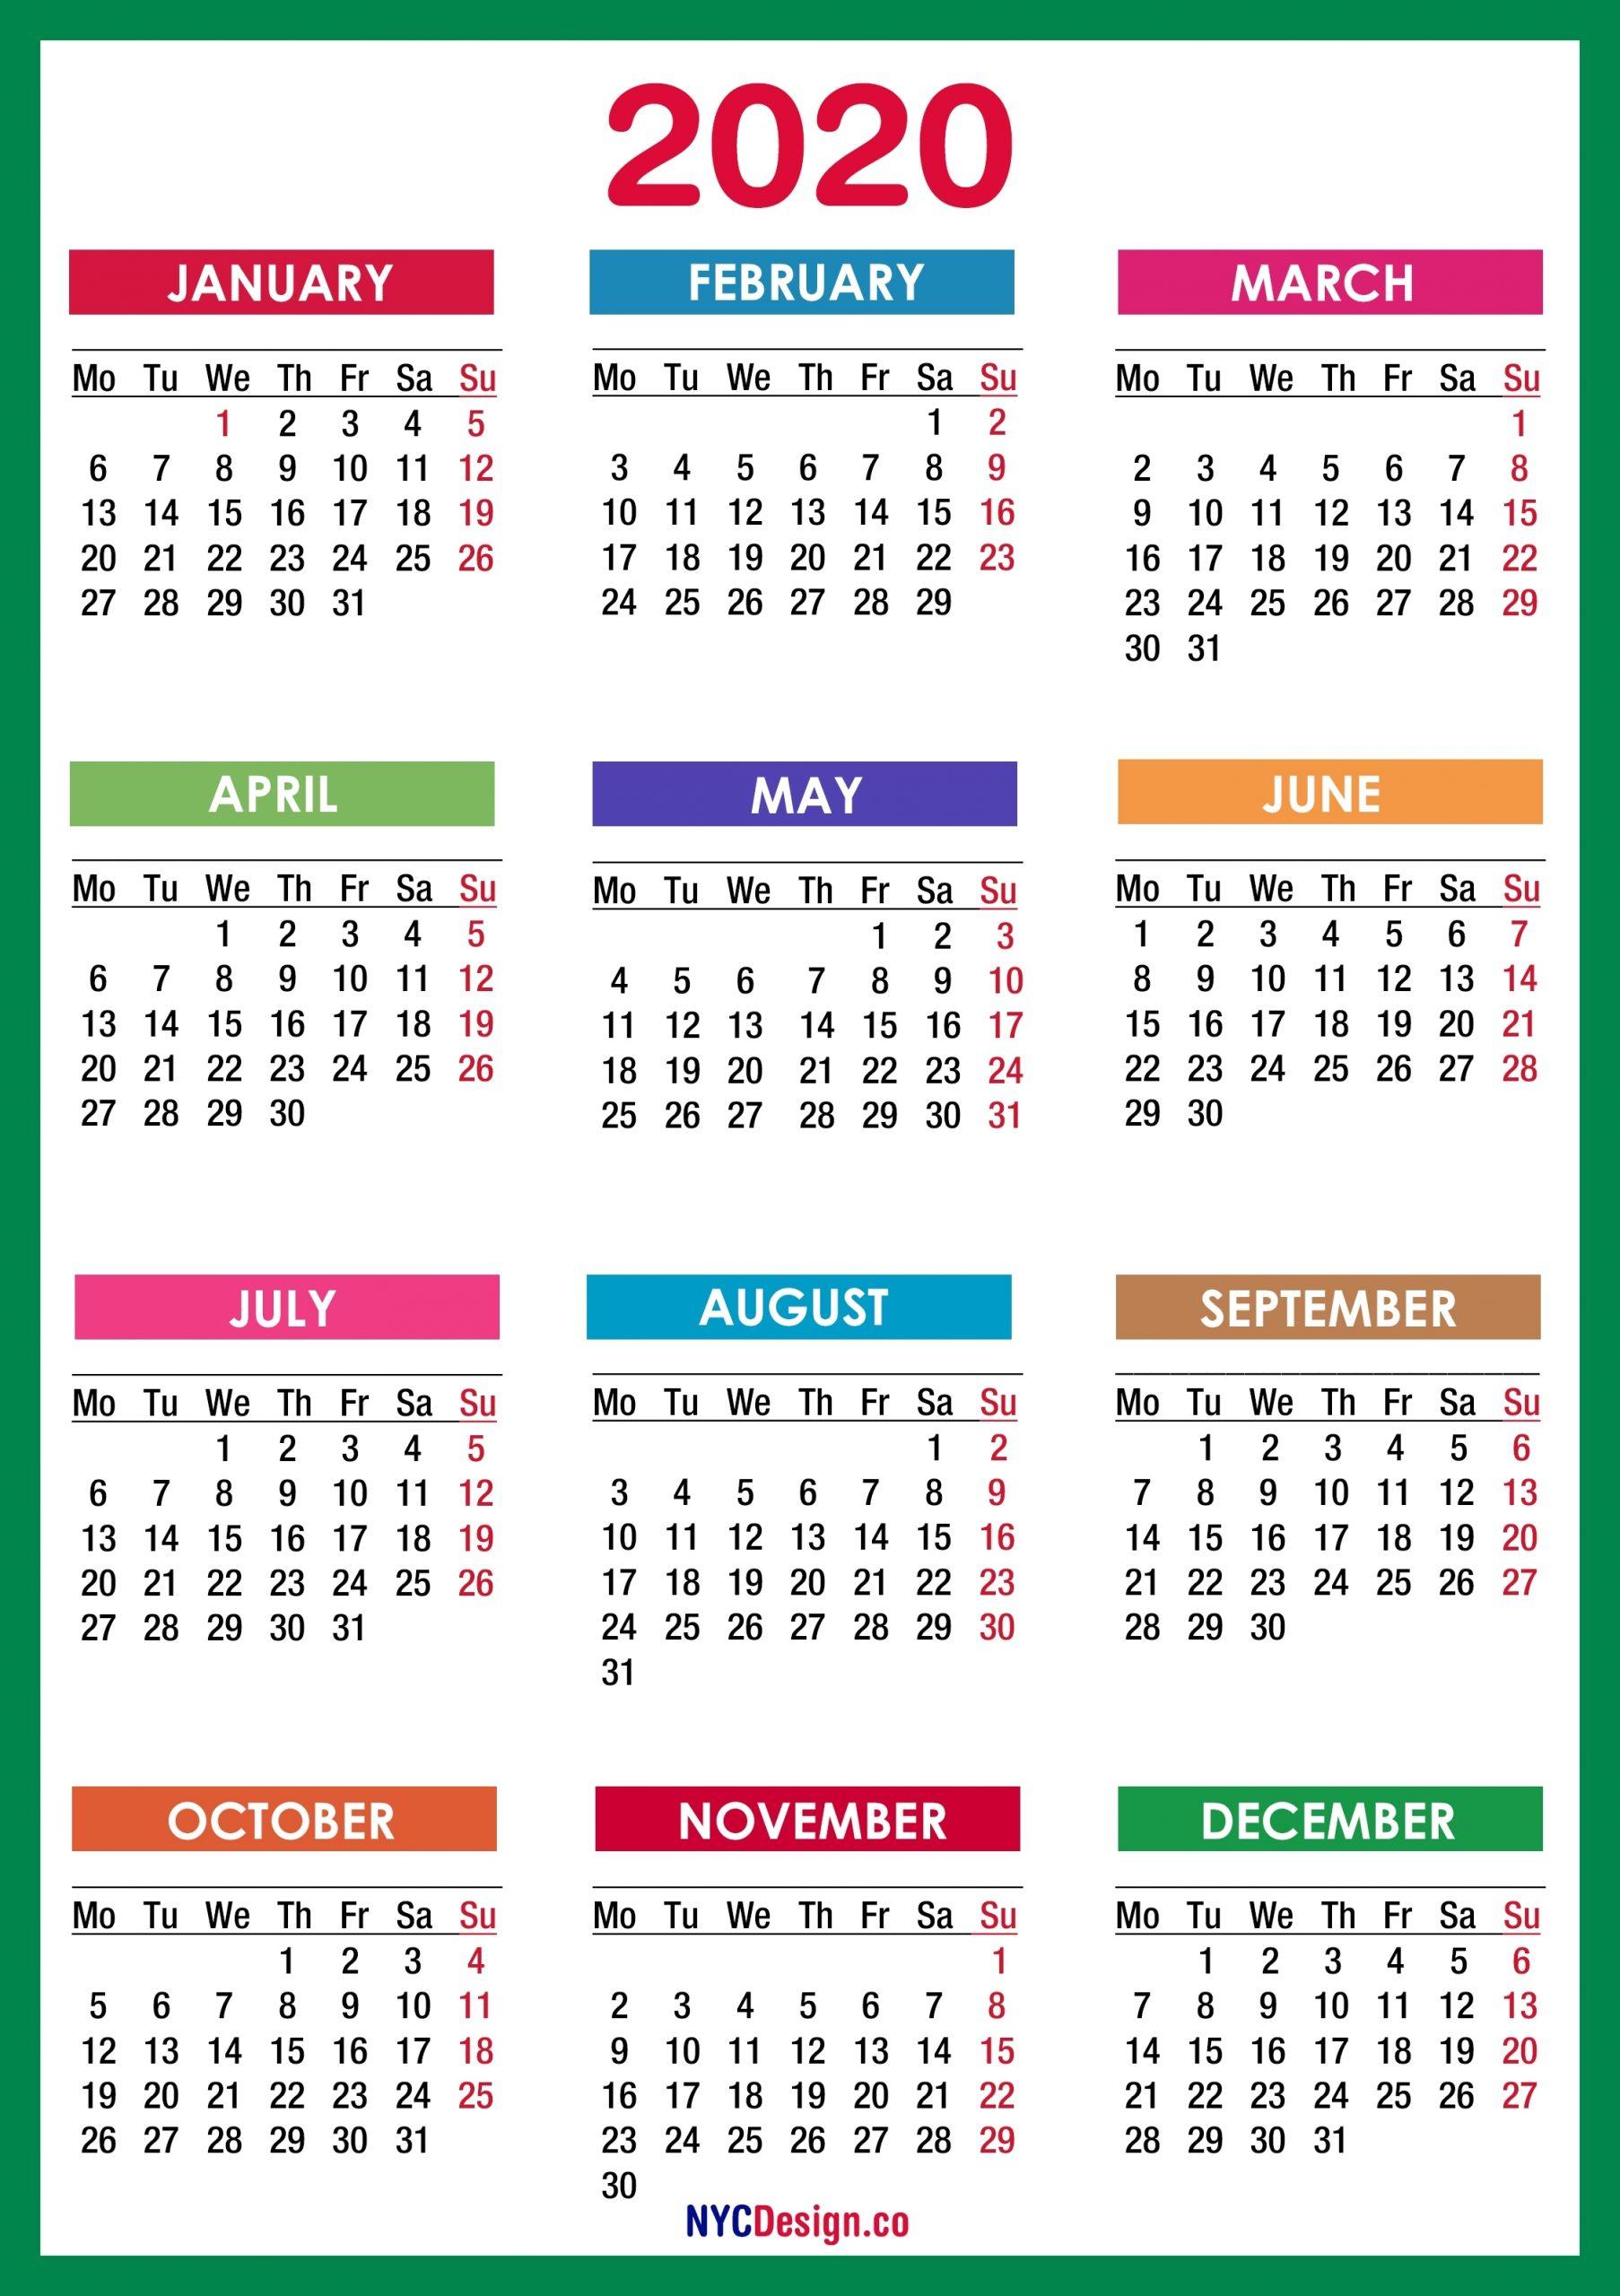 2020 Calendar Printable Free, Pdf, Colorful, Blue, Green for 2020 Calendar Printable Free Pdf Color